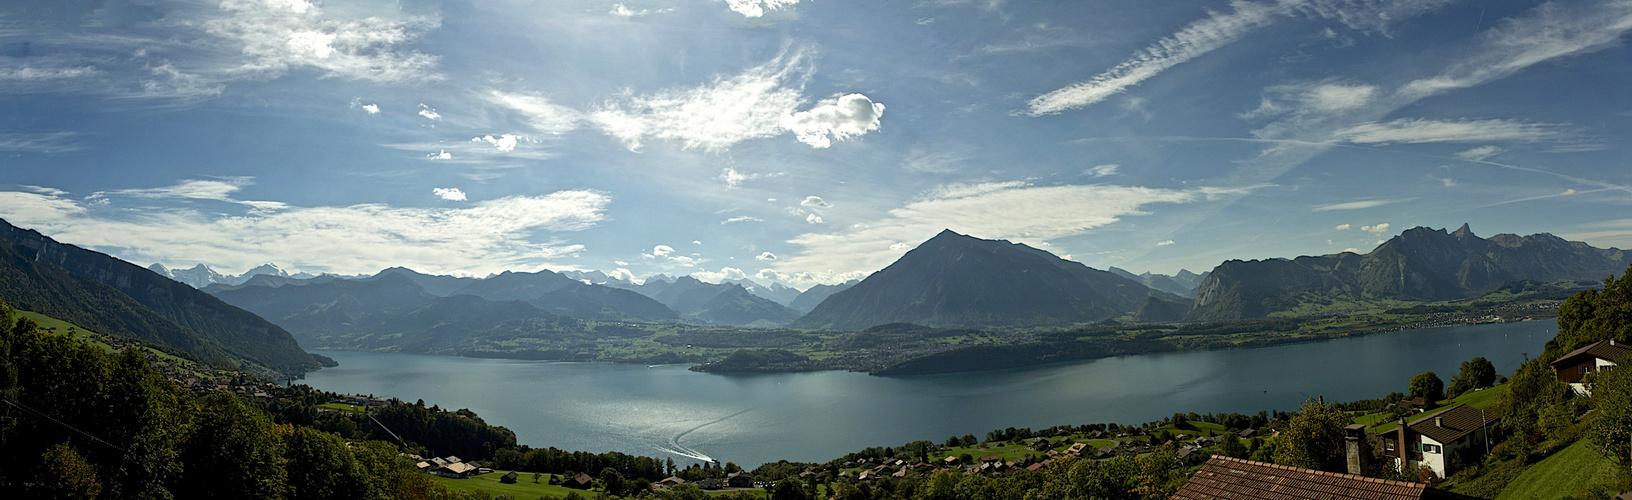 Thunersee im Berner Oberland